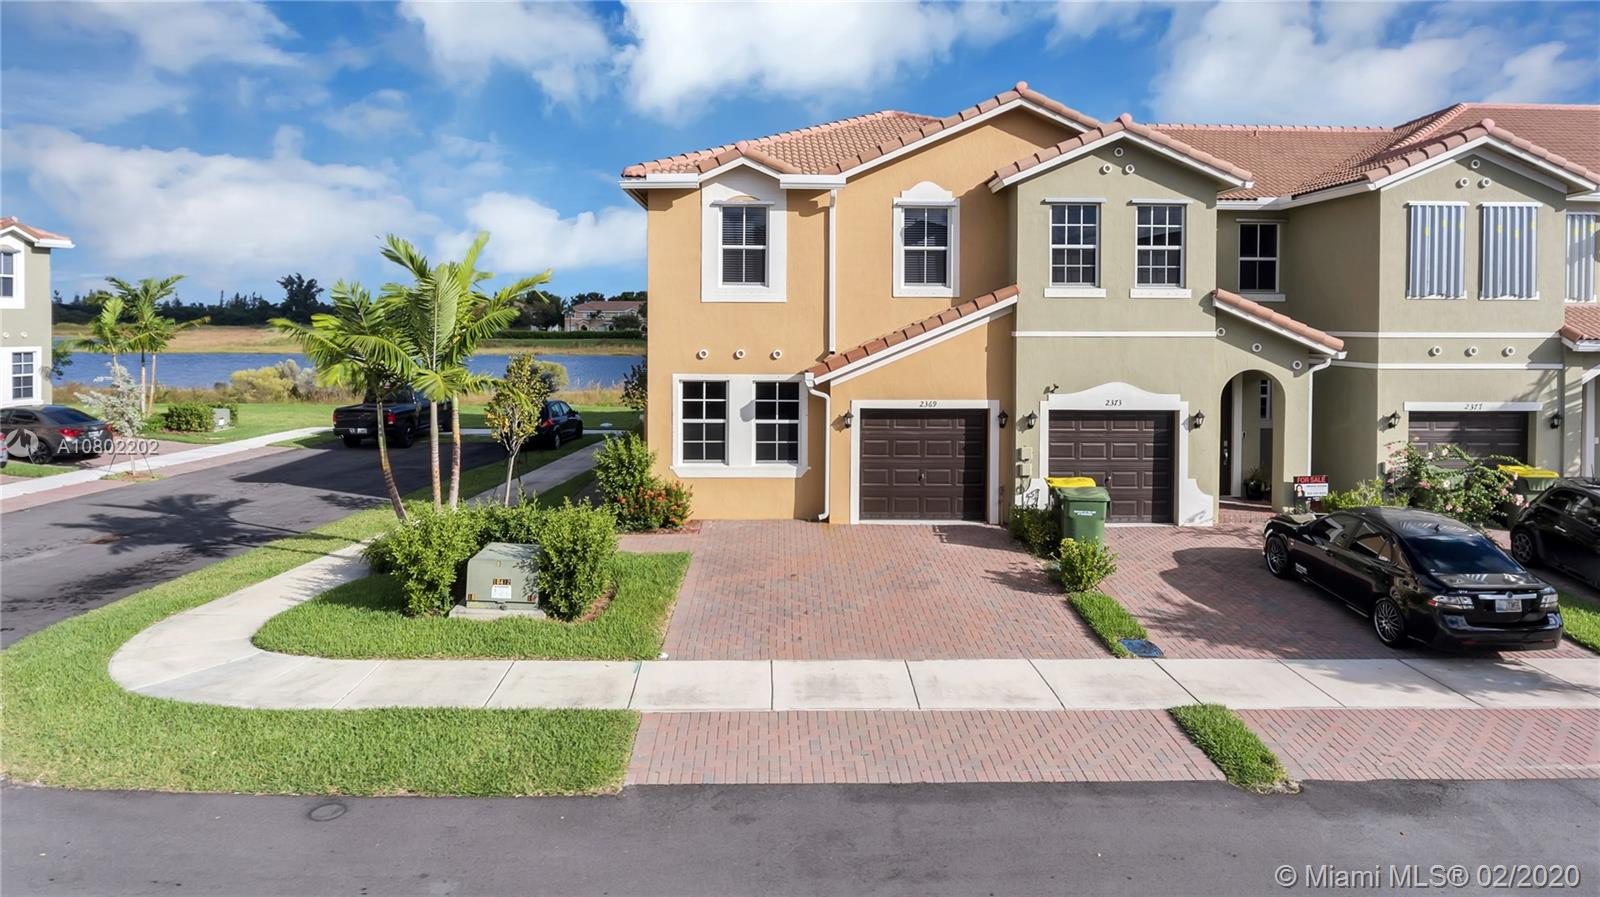 2369 SE 14th St, Homestead, FL 33035 - Homestead, FL real estate listing